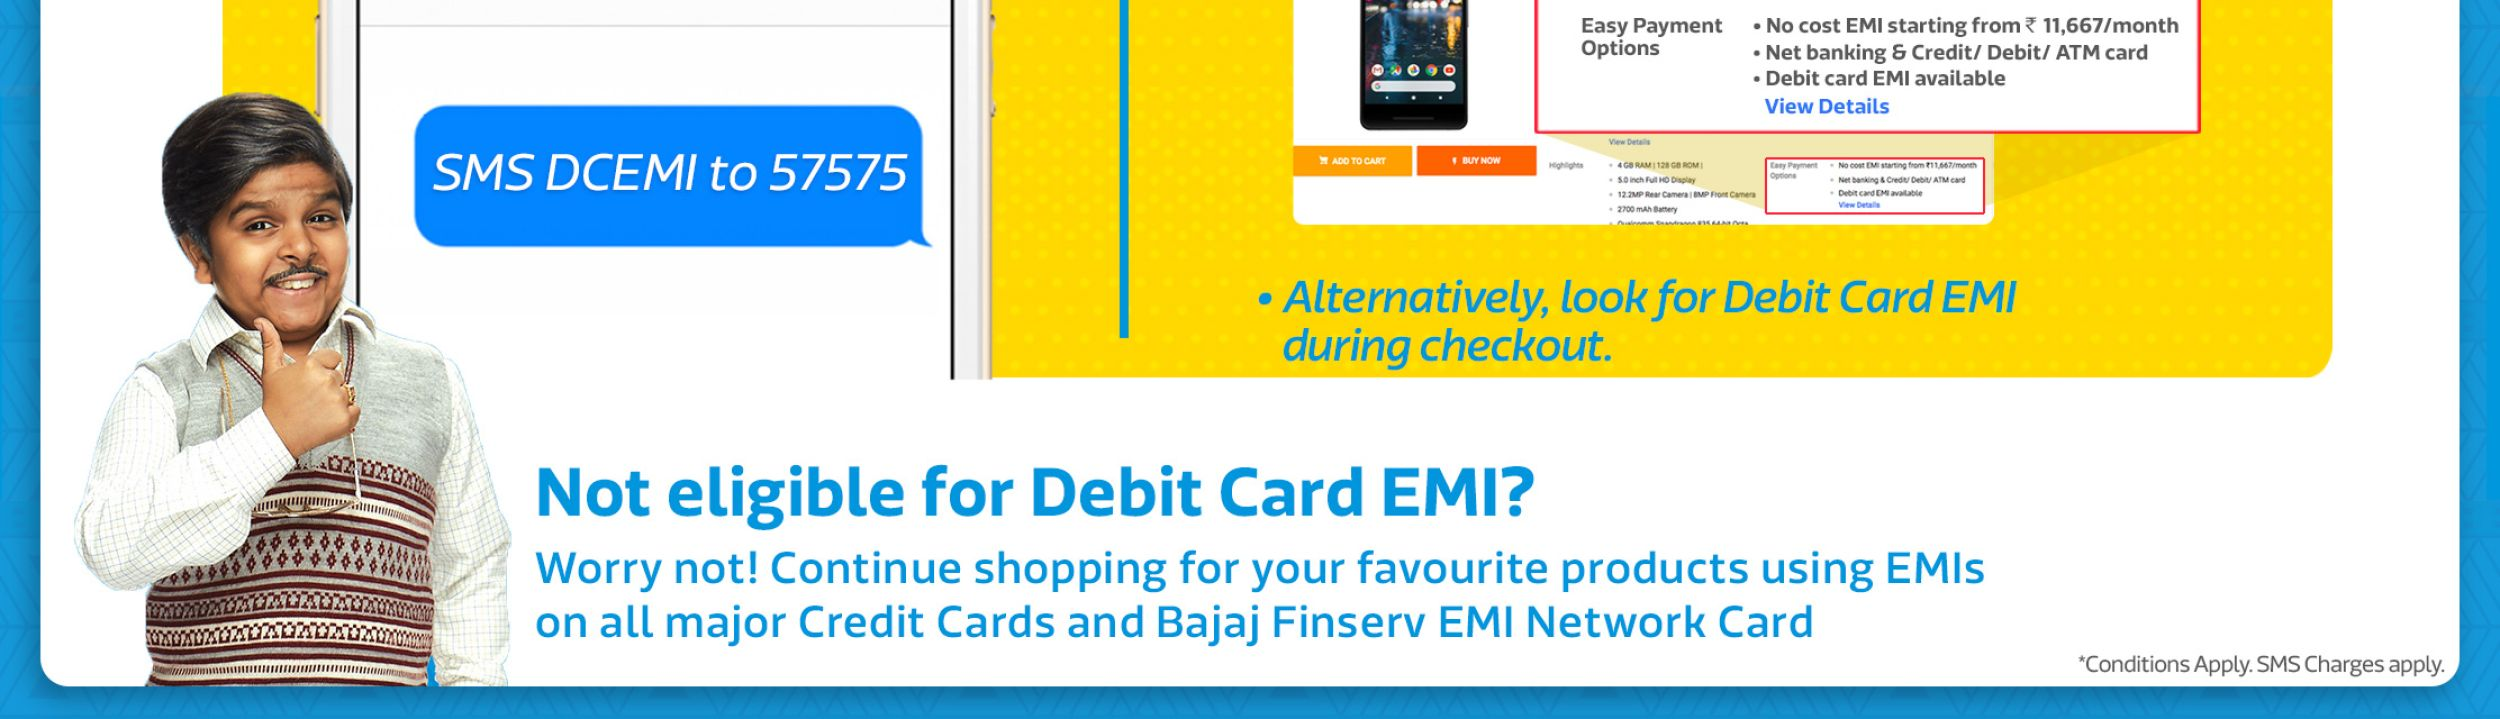 c3704f89e ... EMI on debit card option. sada sada. aqwsass aqwsass. qawseds qawseds